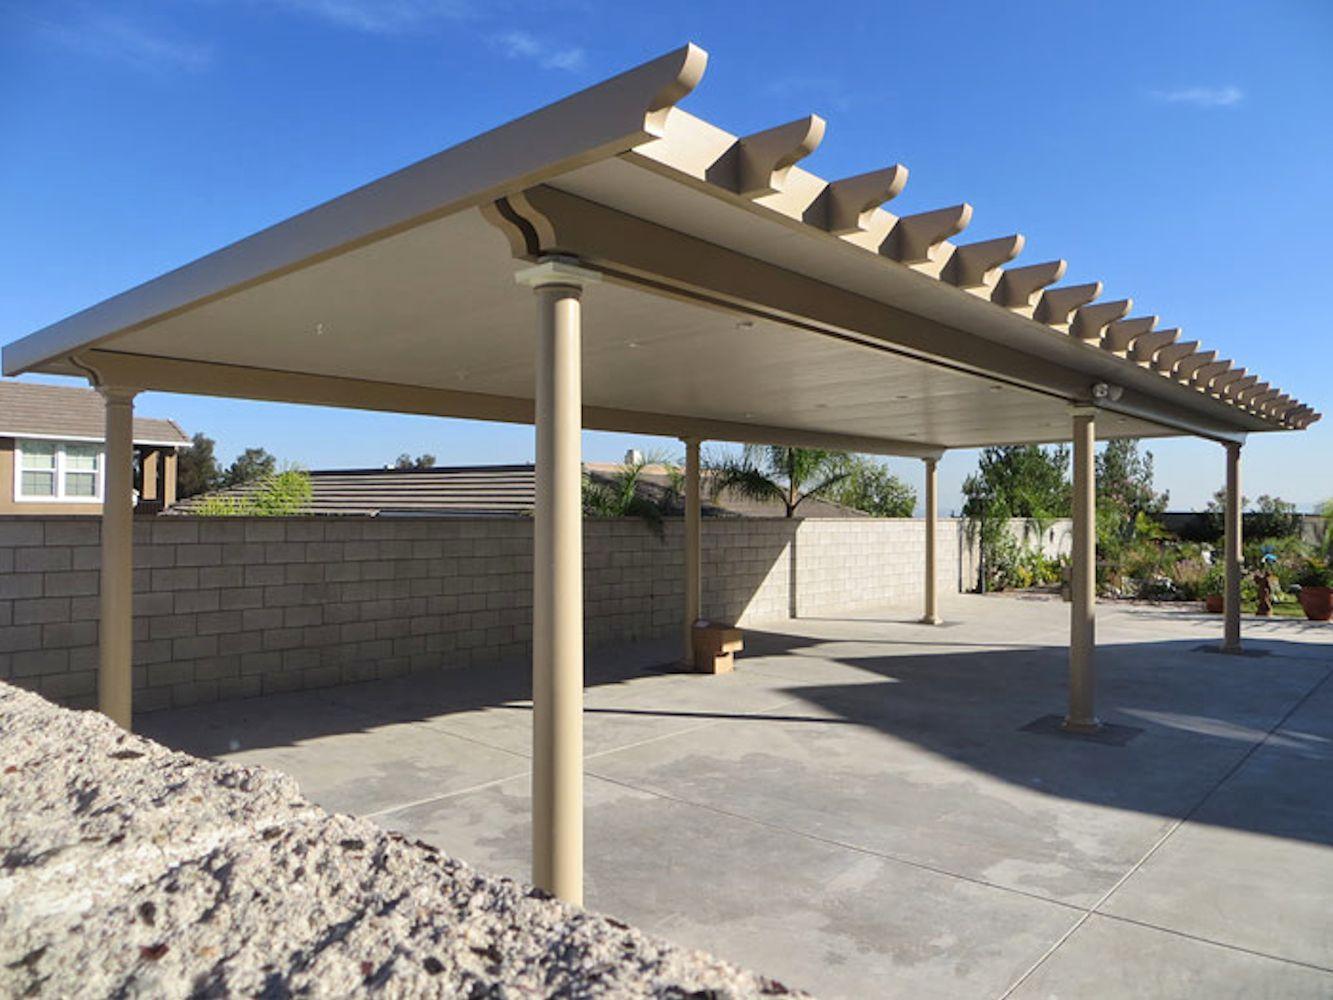 Alumawood Carport Pergola with roof, Pergola, Roof panels